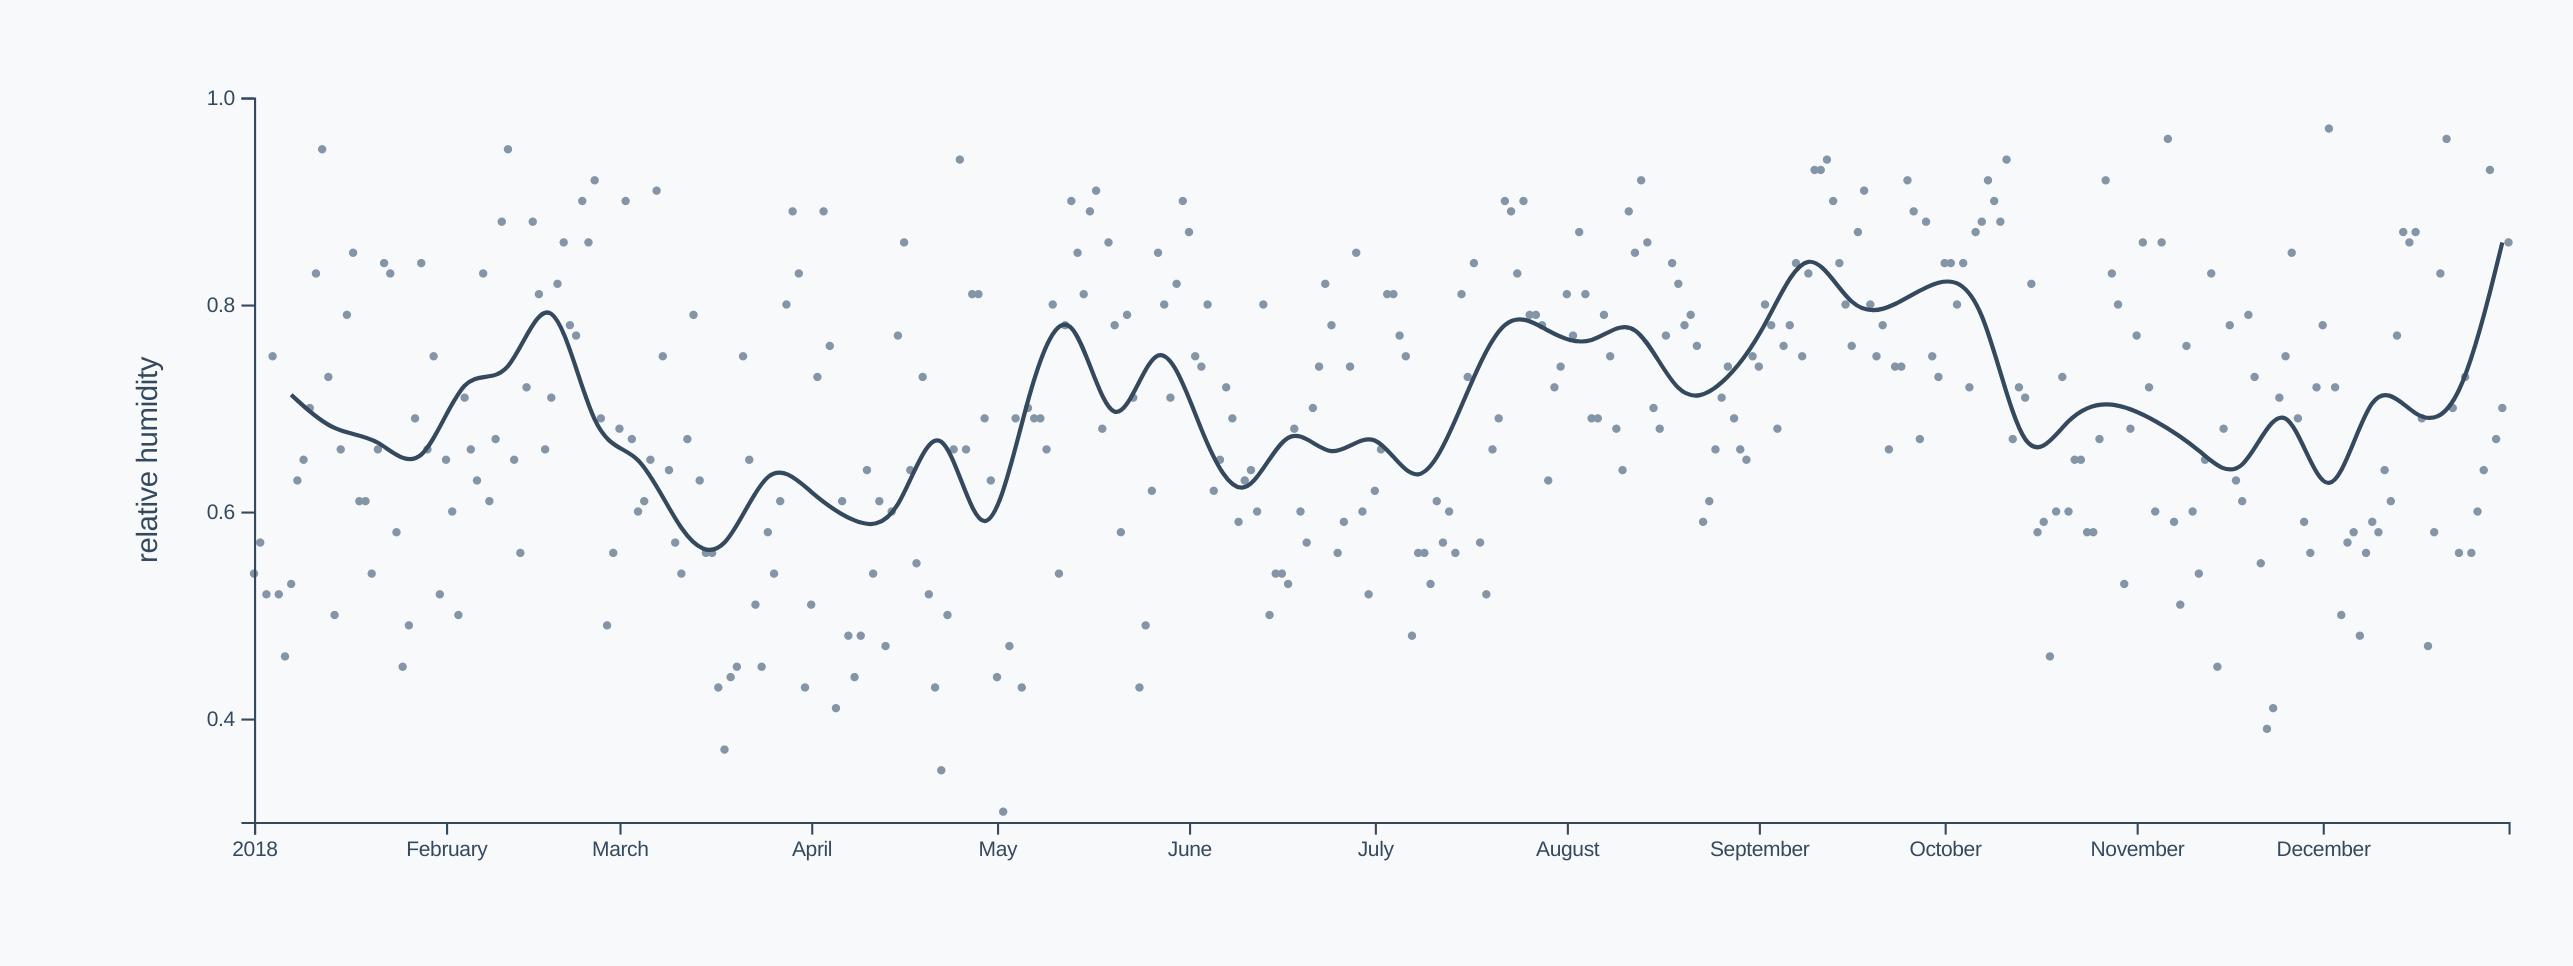 Humidity timeline, simpler